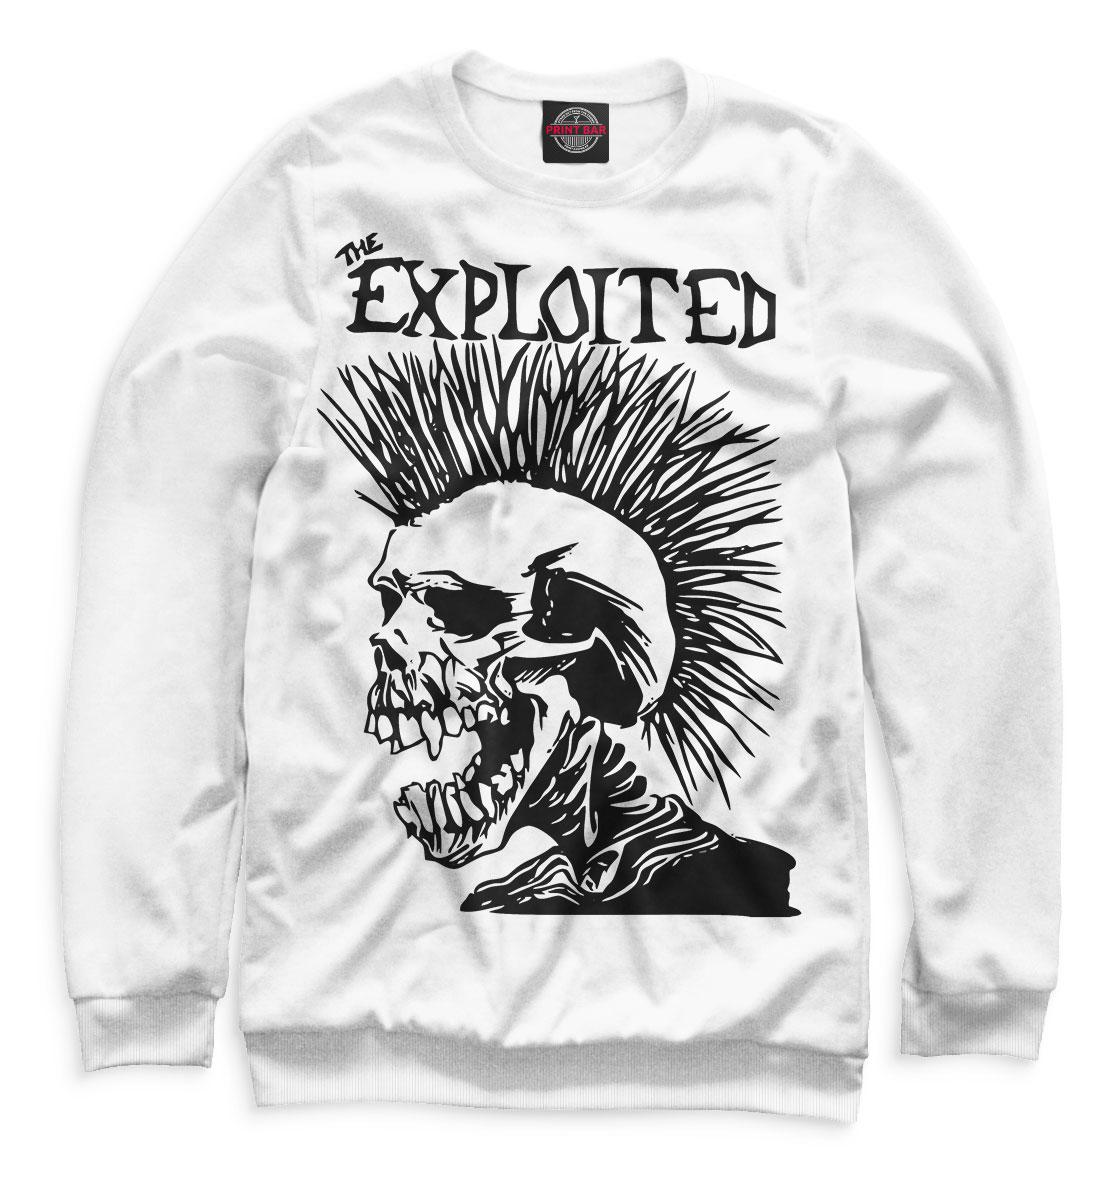 Купить The Exploited, Printbar, Свитшоты, TEX-196189-swi-2